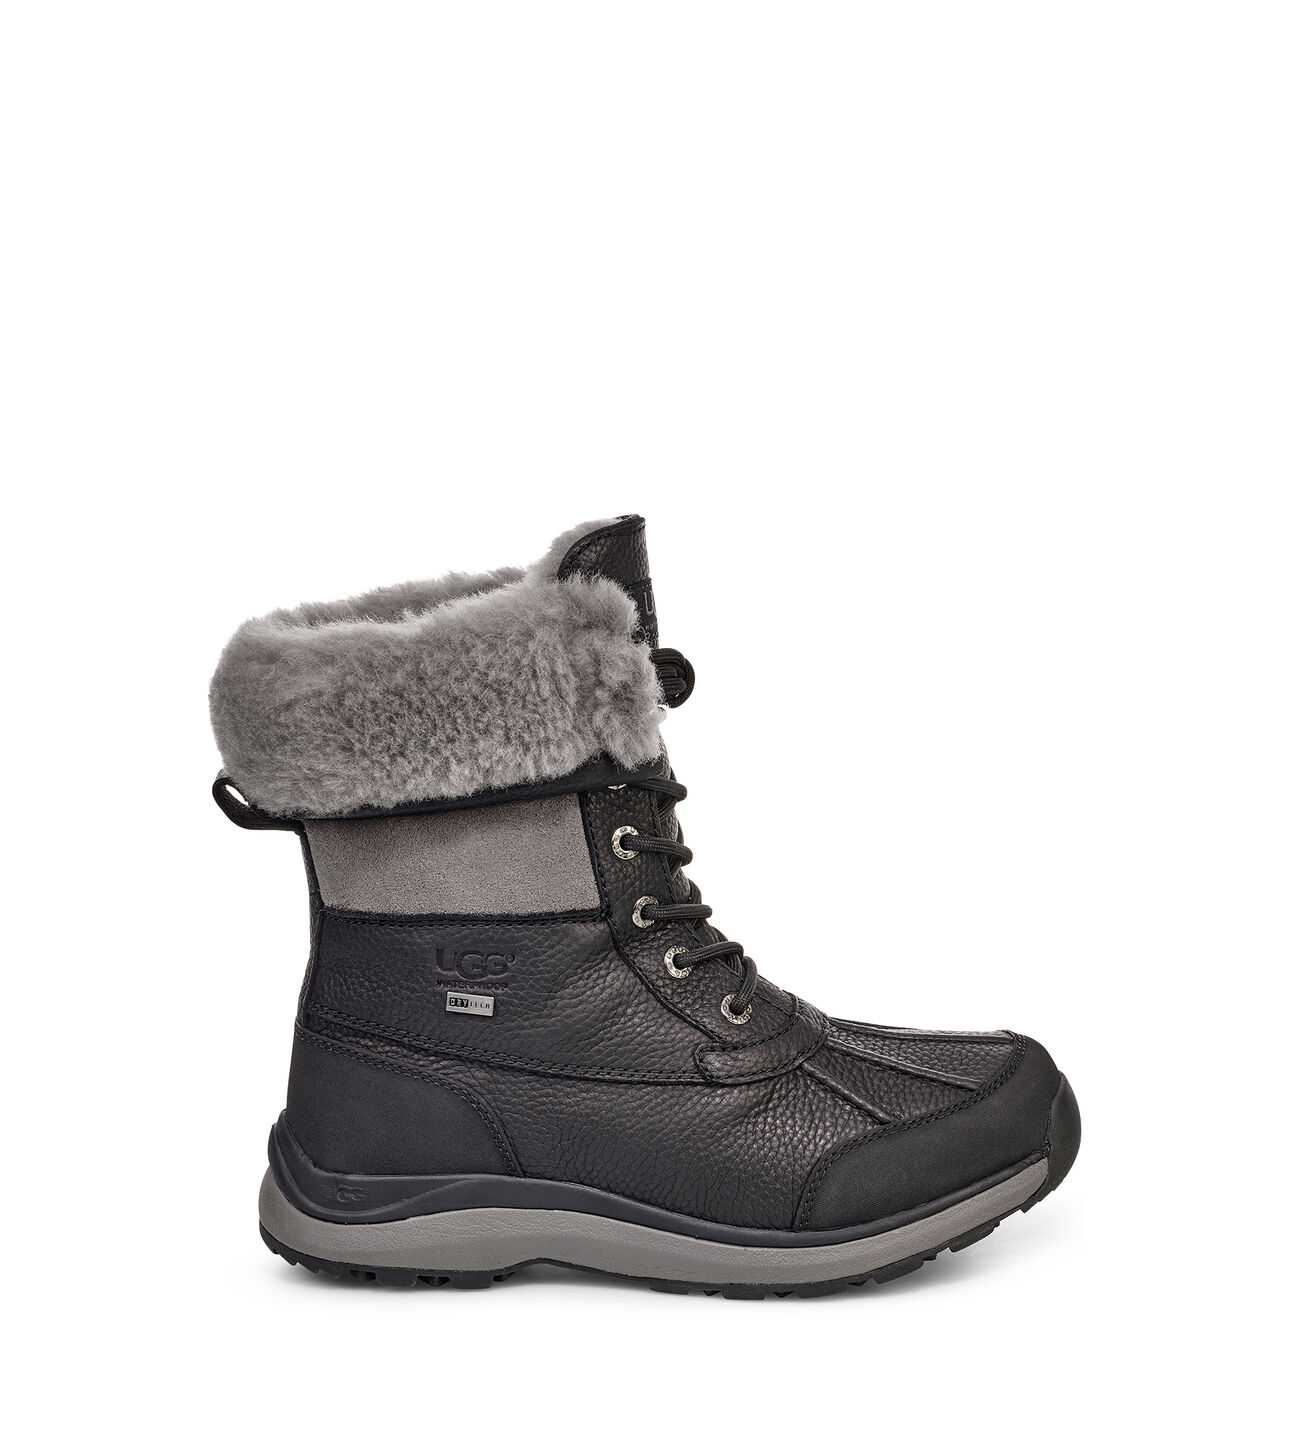 5a79765ffd1 Adirondack III Boot